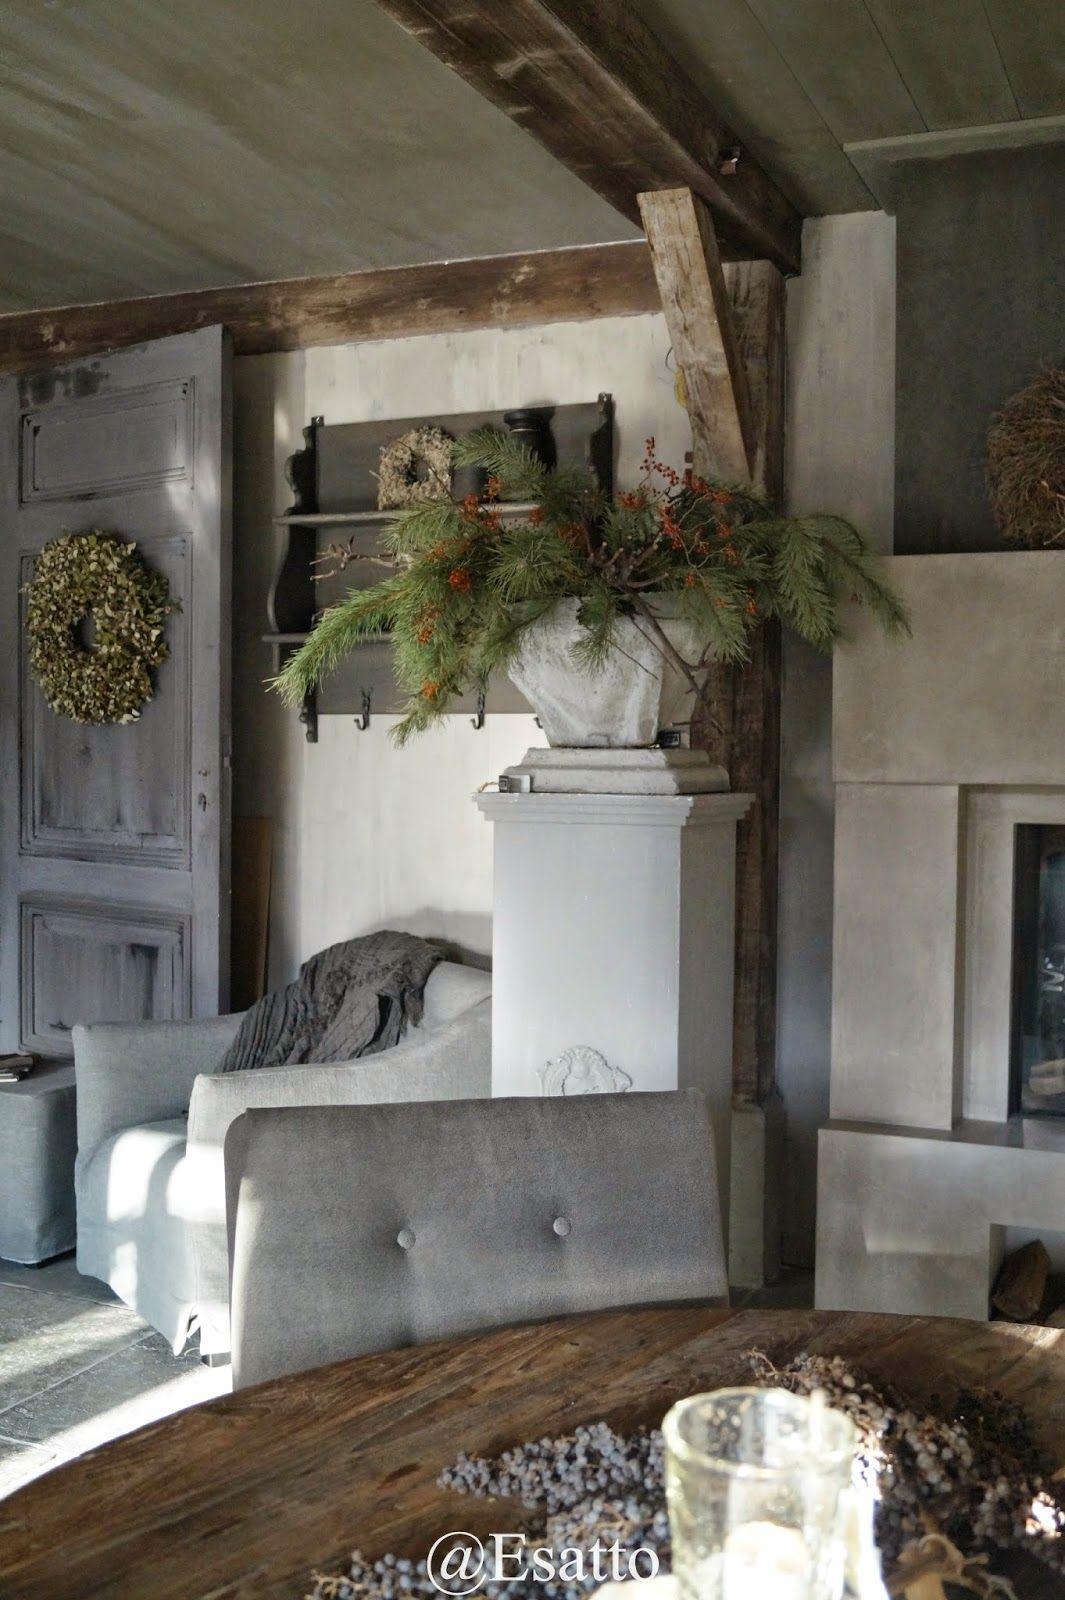 Esatto sobere stijl home decorating decoration for Wonen landelijke stijl decoreren